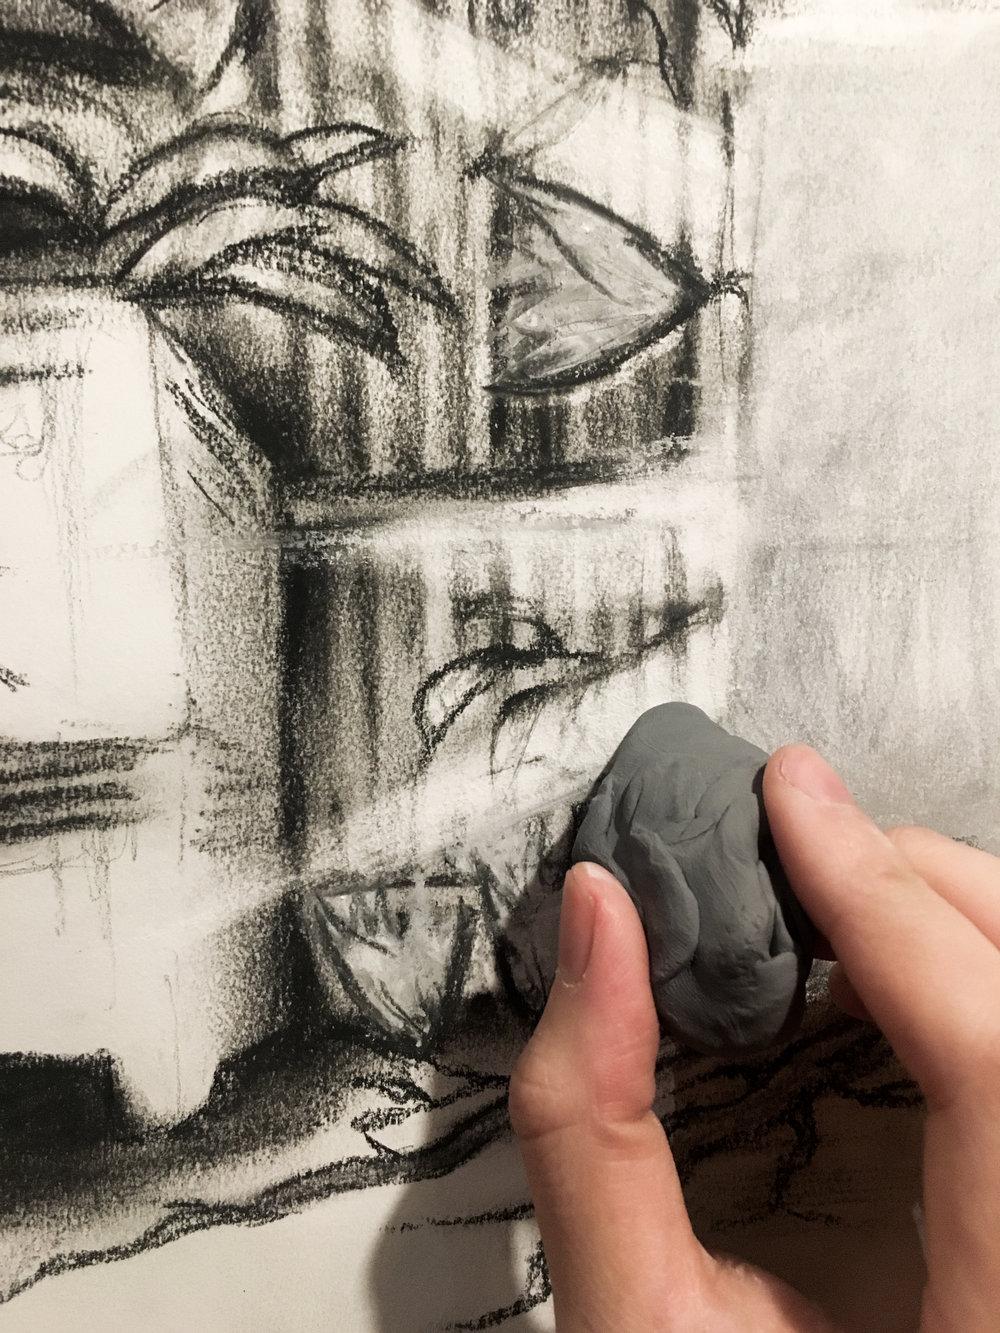 Close-up of erasure using a kneadable eraser